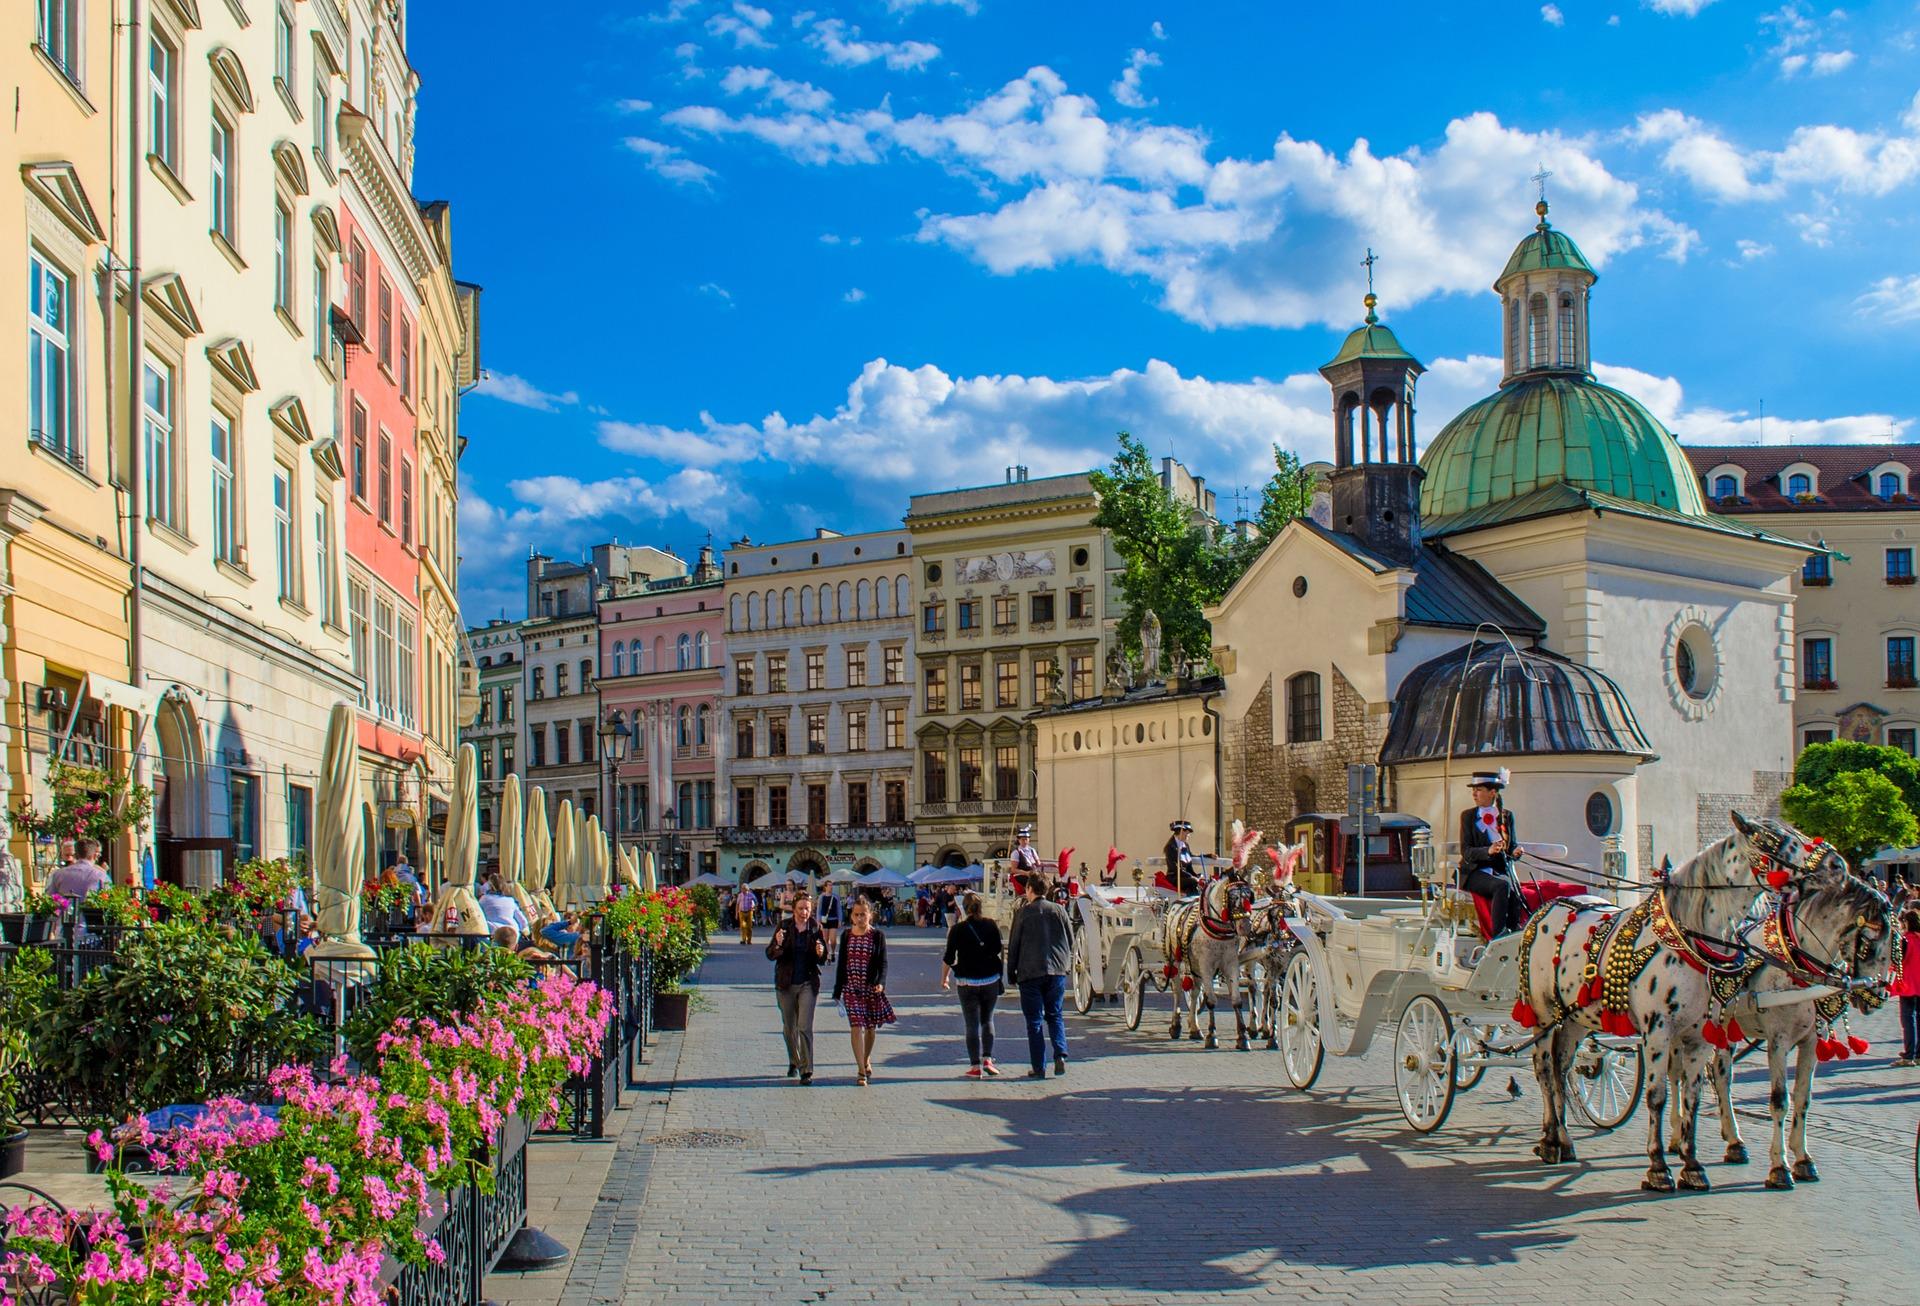 Poland_Krakow_Citycenter